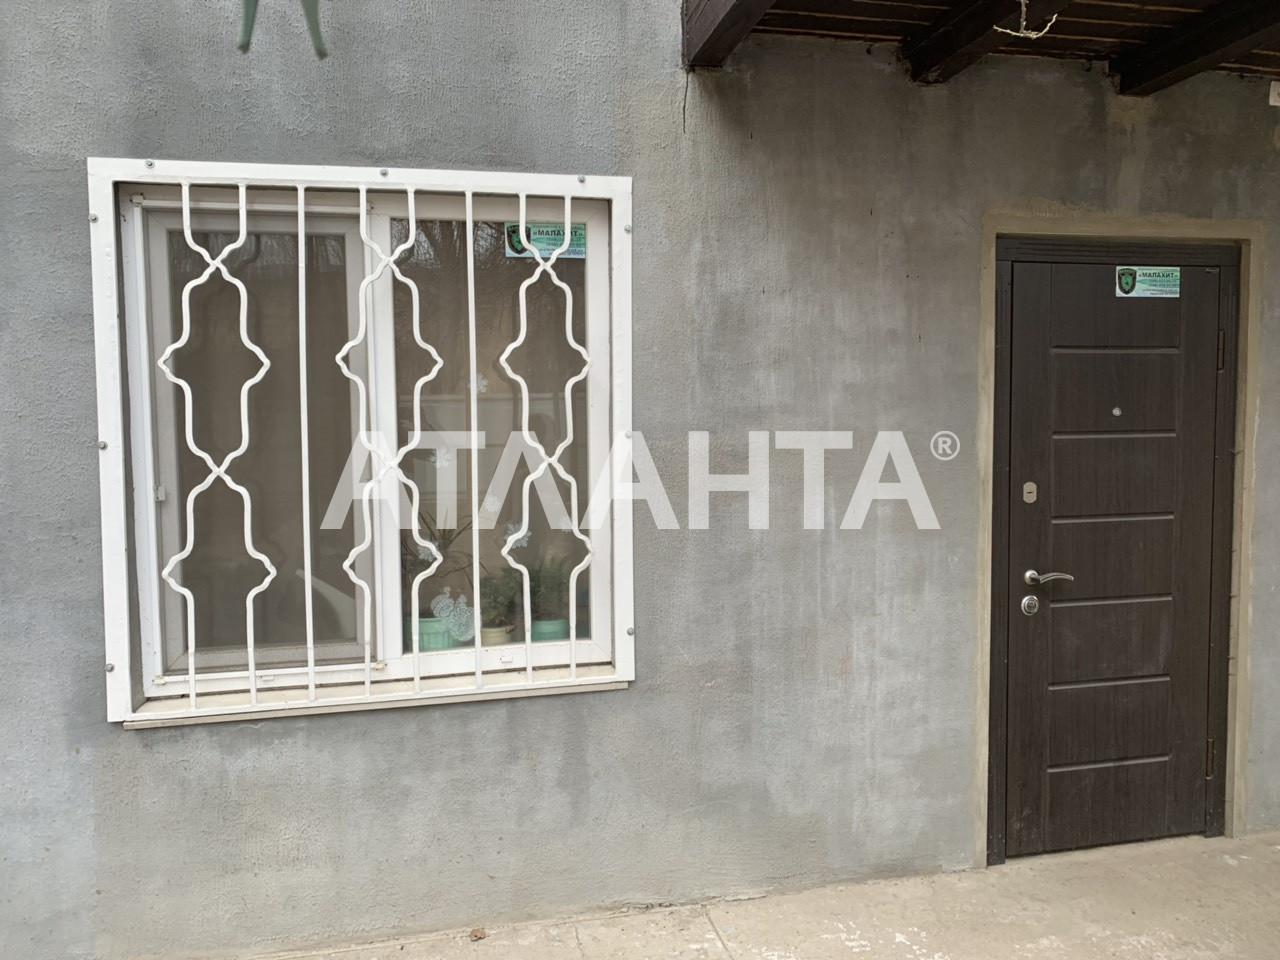 Продается 1-комнатная Квартира на ул. Балтская Дор. — 20 000 у.е. (фото №12)